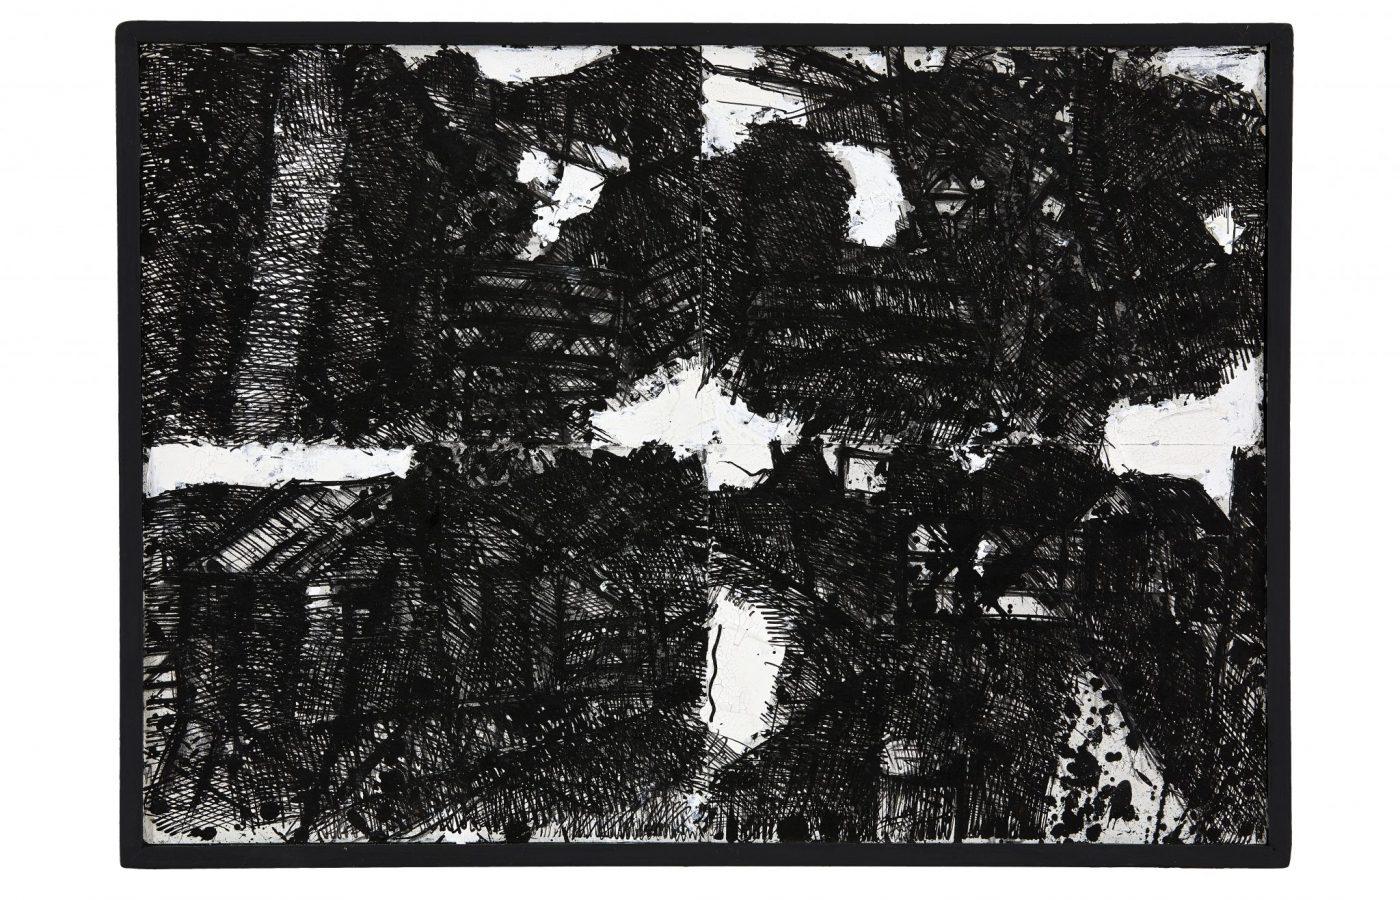 FXF18-60 John Virtue Landscape No 113 1990-91